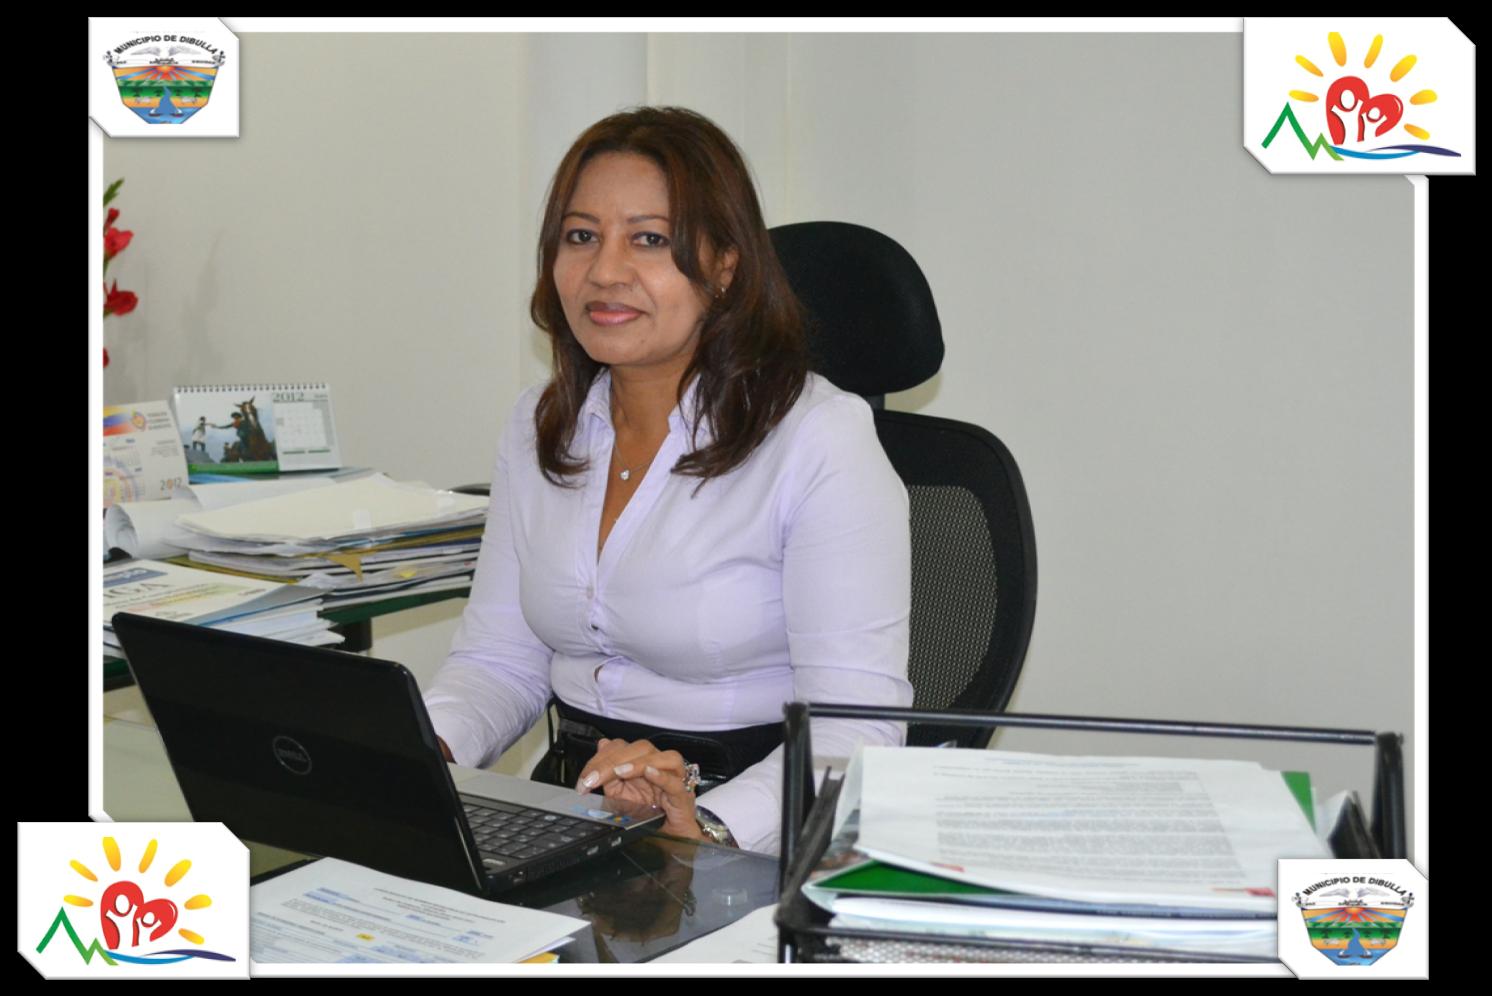 Dra. SILVIA MERCEDES OSPINO BERMUDEZ